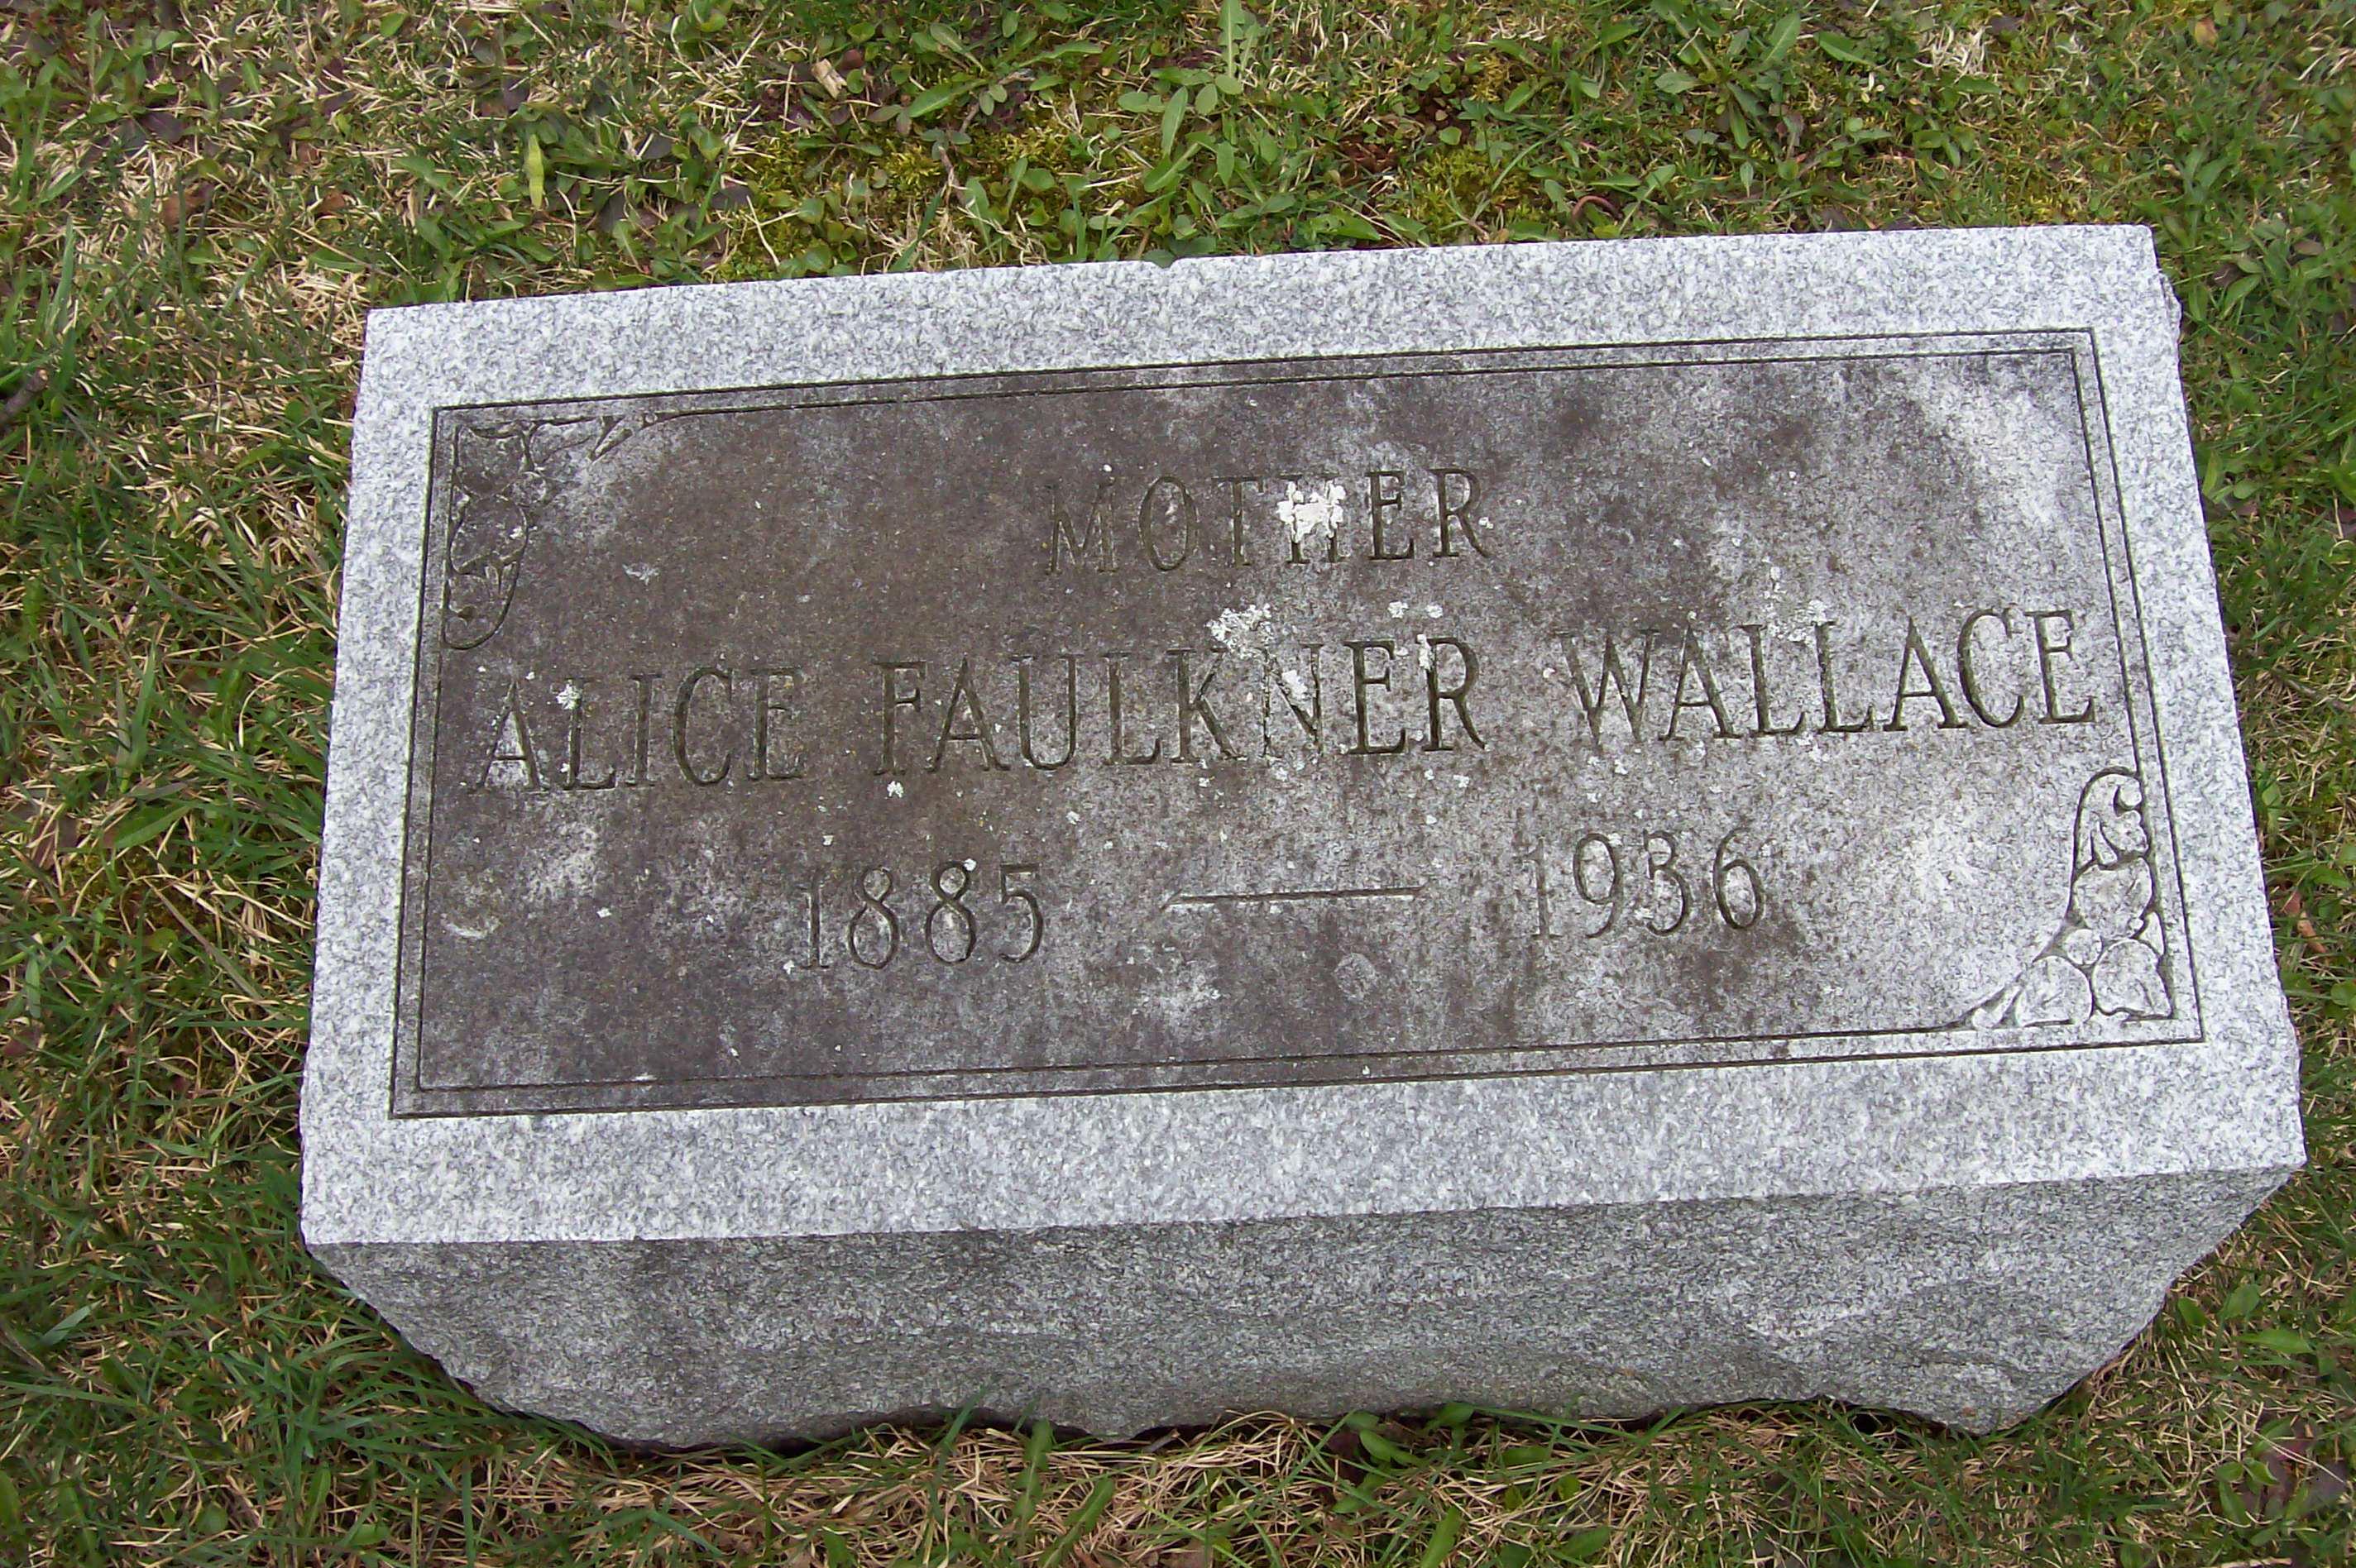 Wallace Faulkner